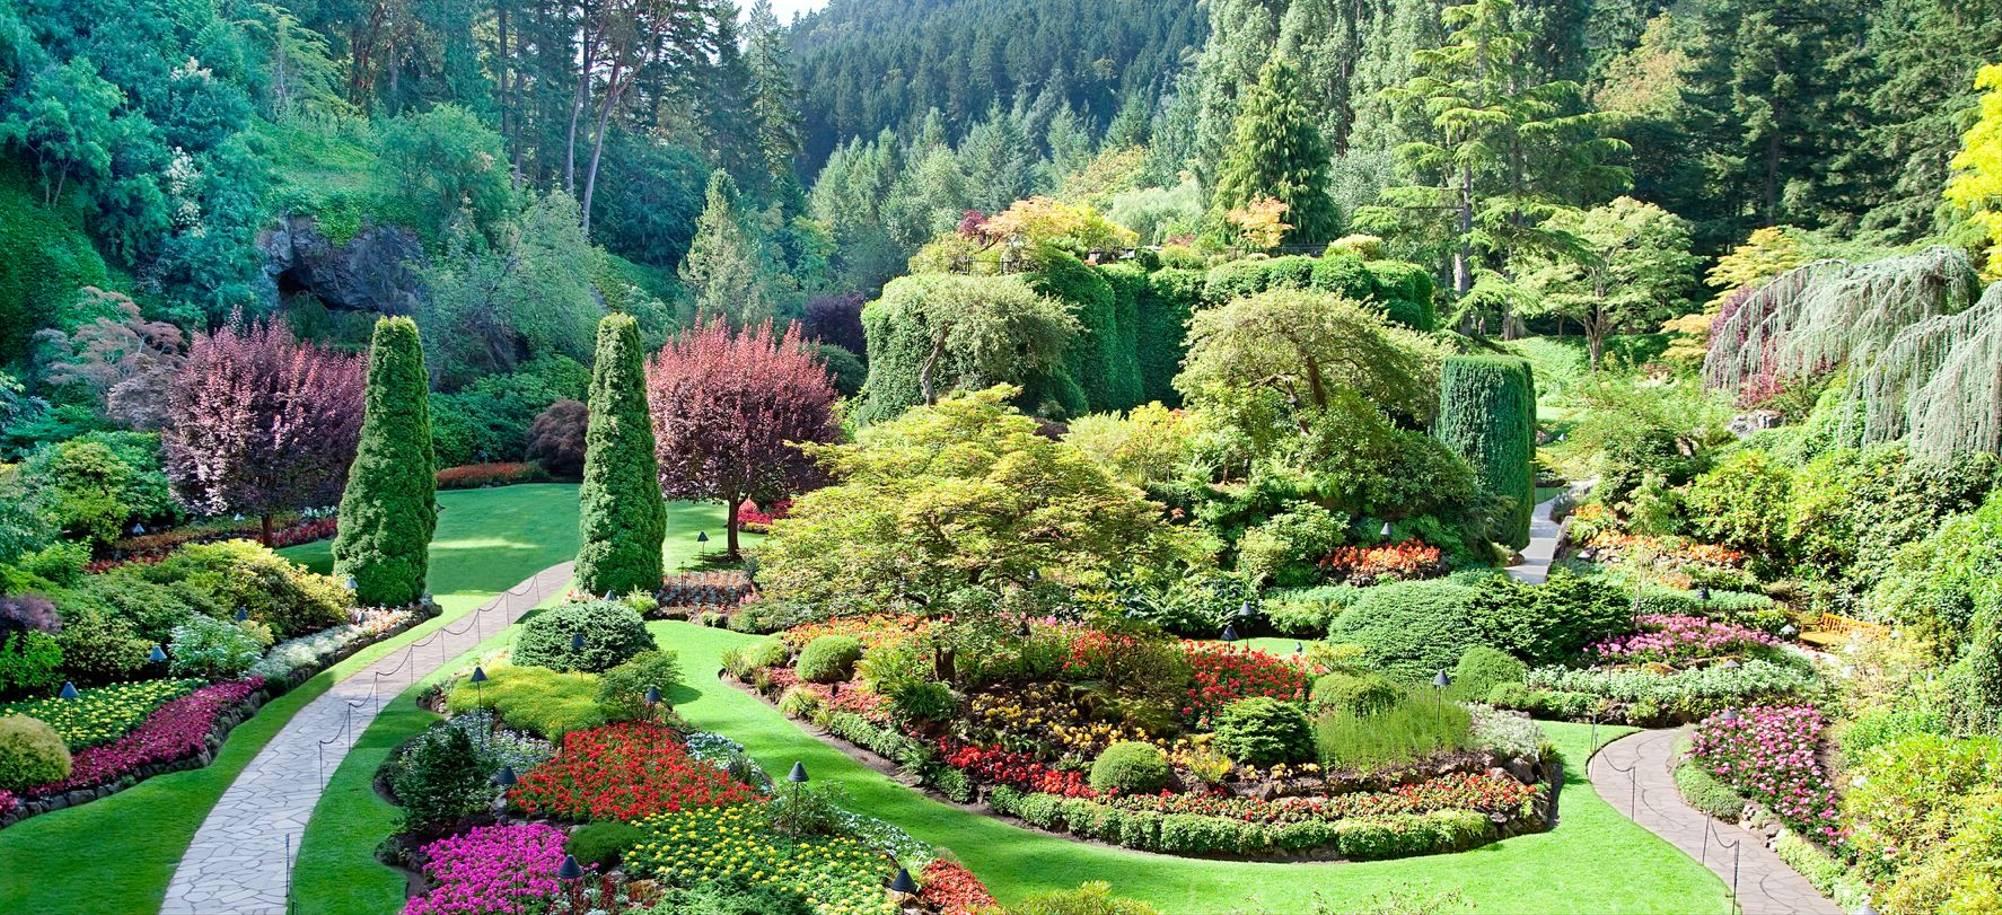 Victoria   Butchart Gardens   Itinerary Desktop